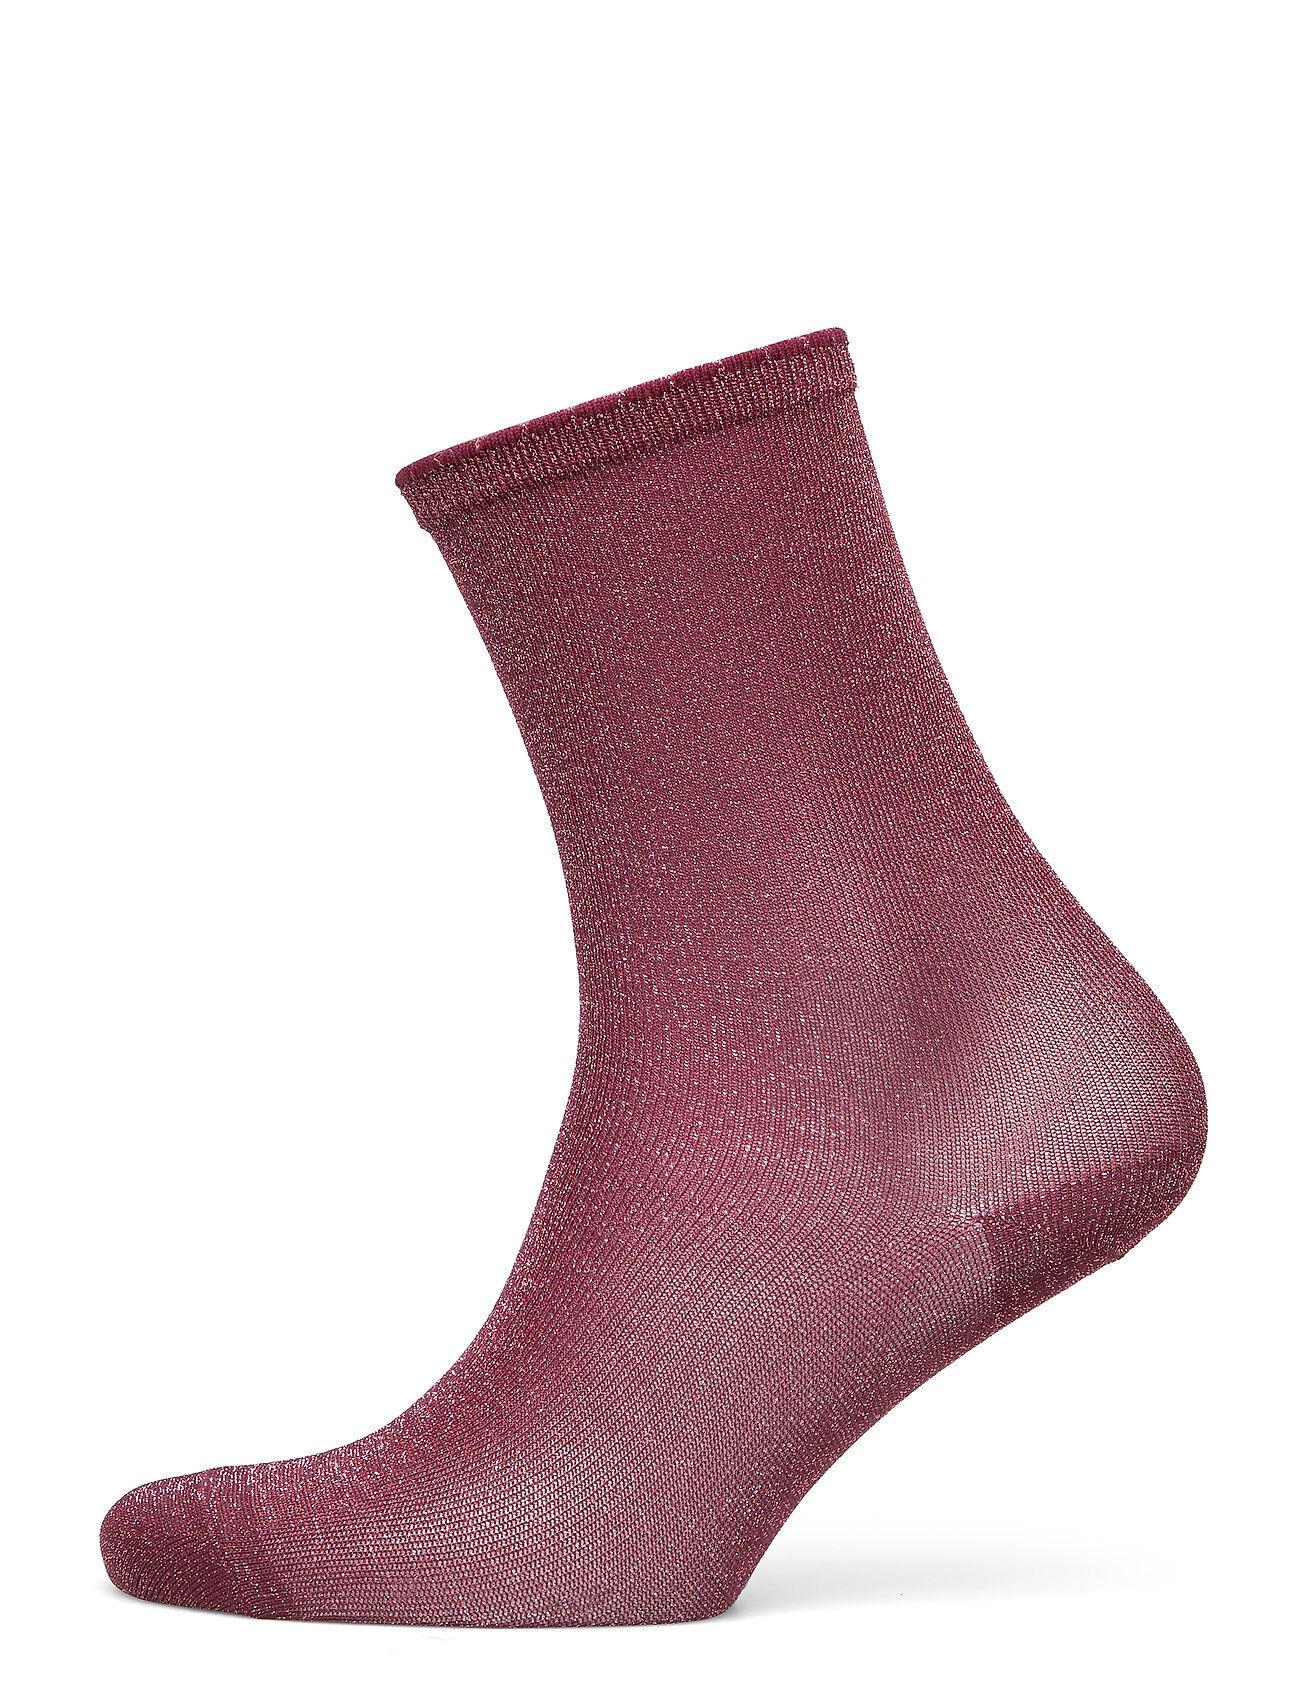 Noa Noa Hosiery Varrettomat Sukat Urheilusukat/Ankle Socks Punainen Noa Noa